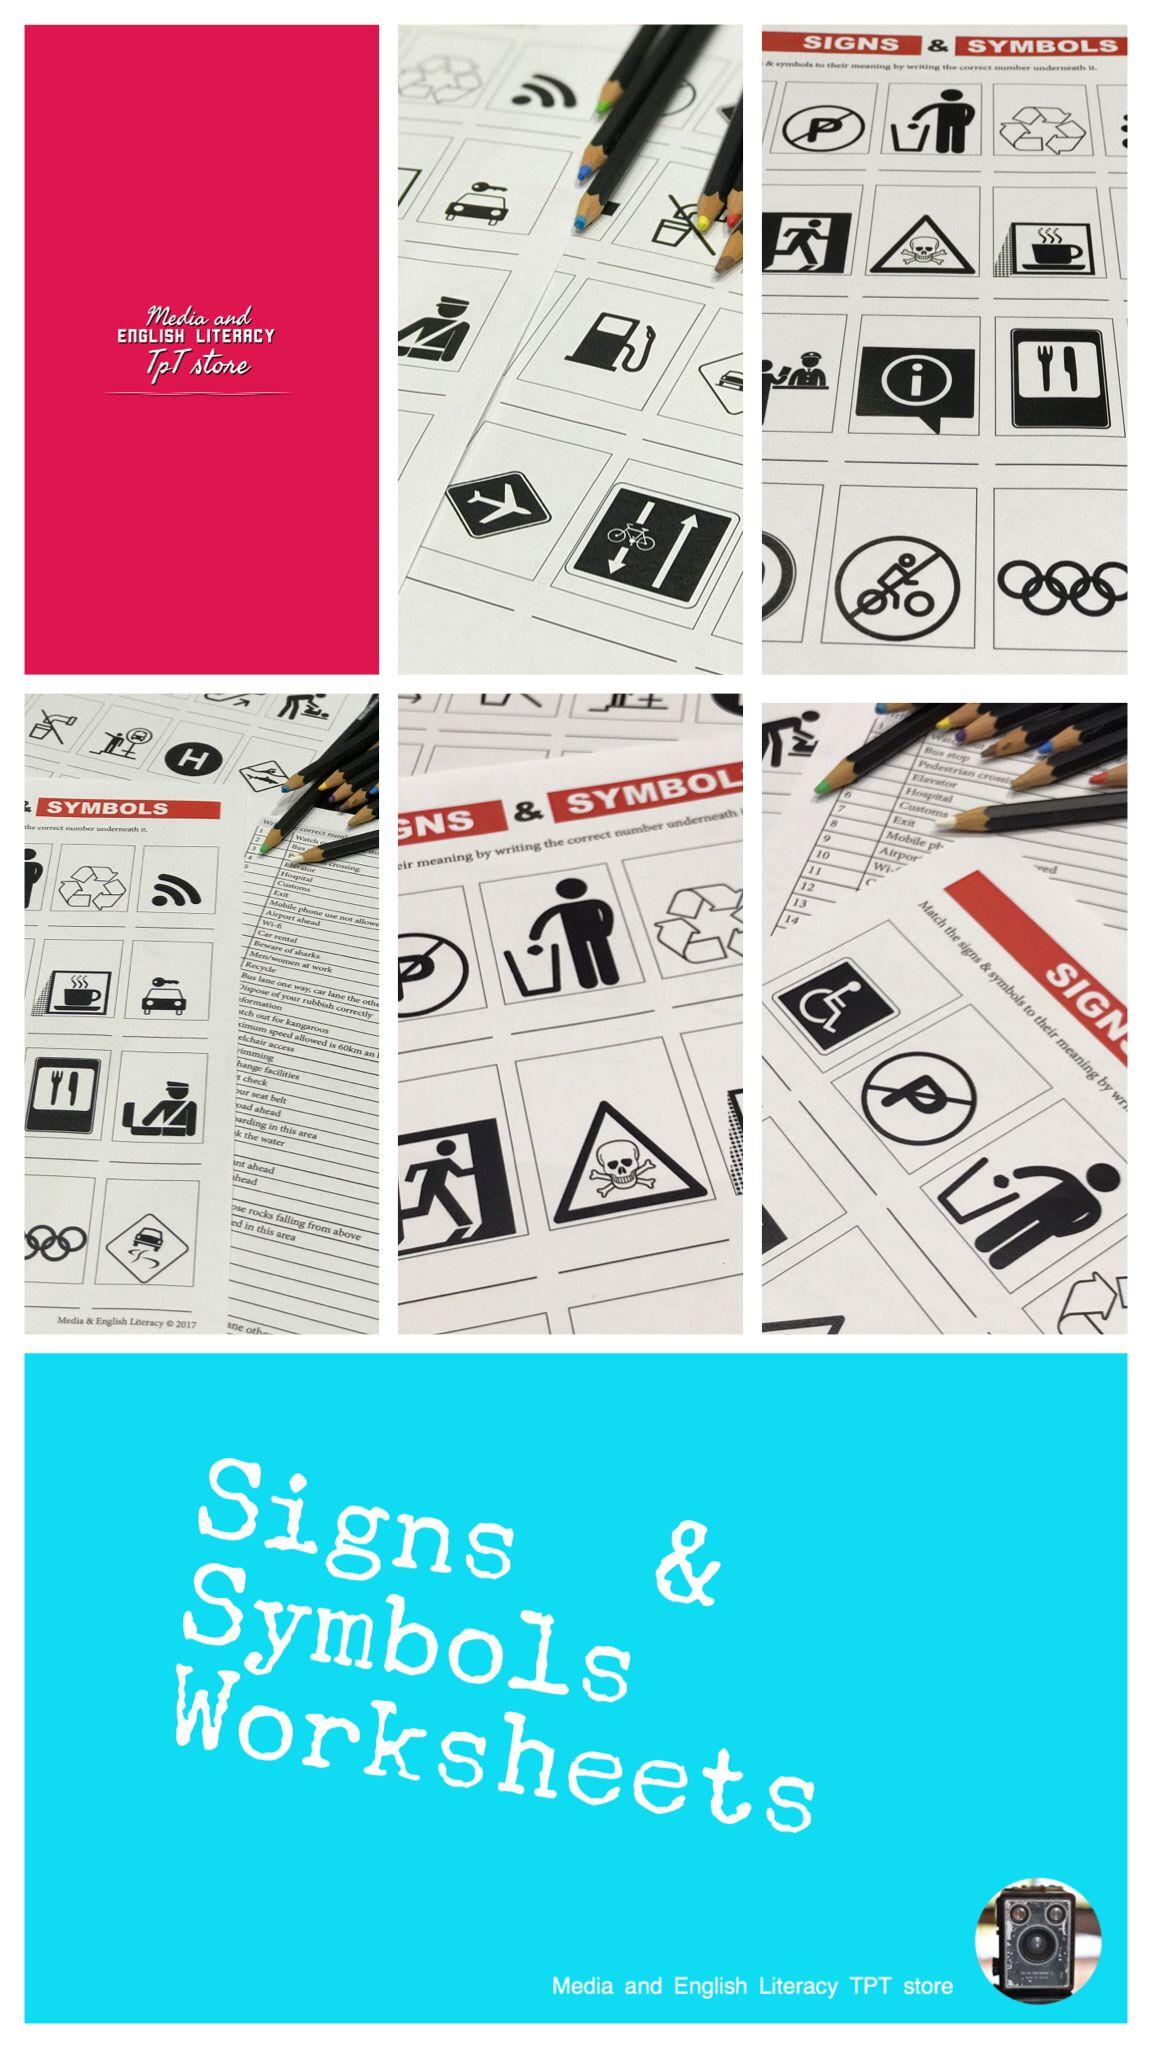 Media literacy - signs & symbols worksheets | Pinterest | Media ...